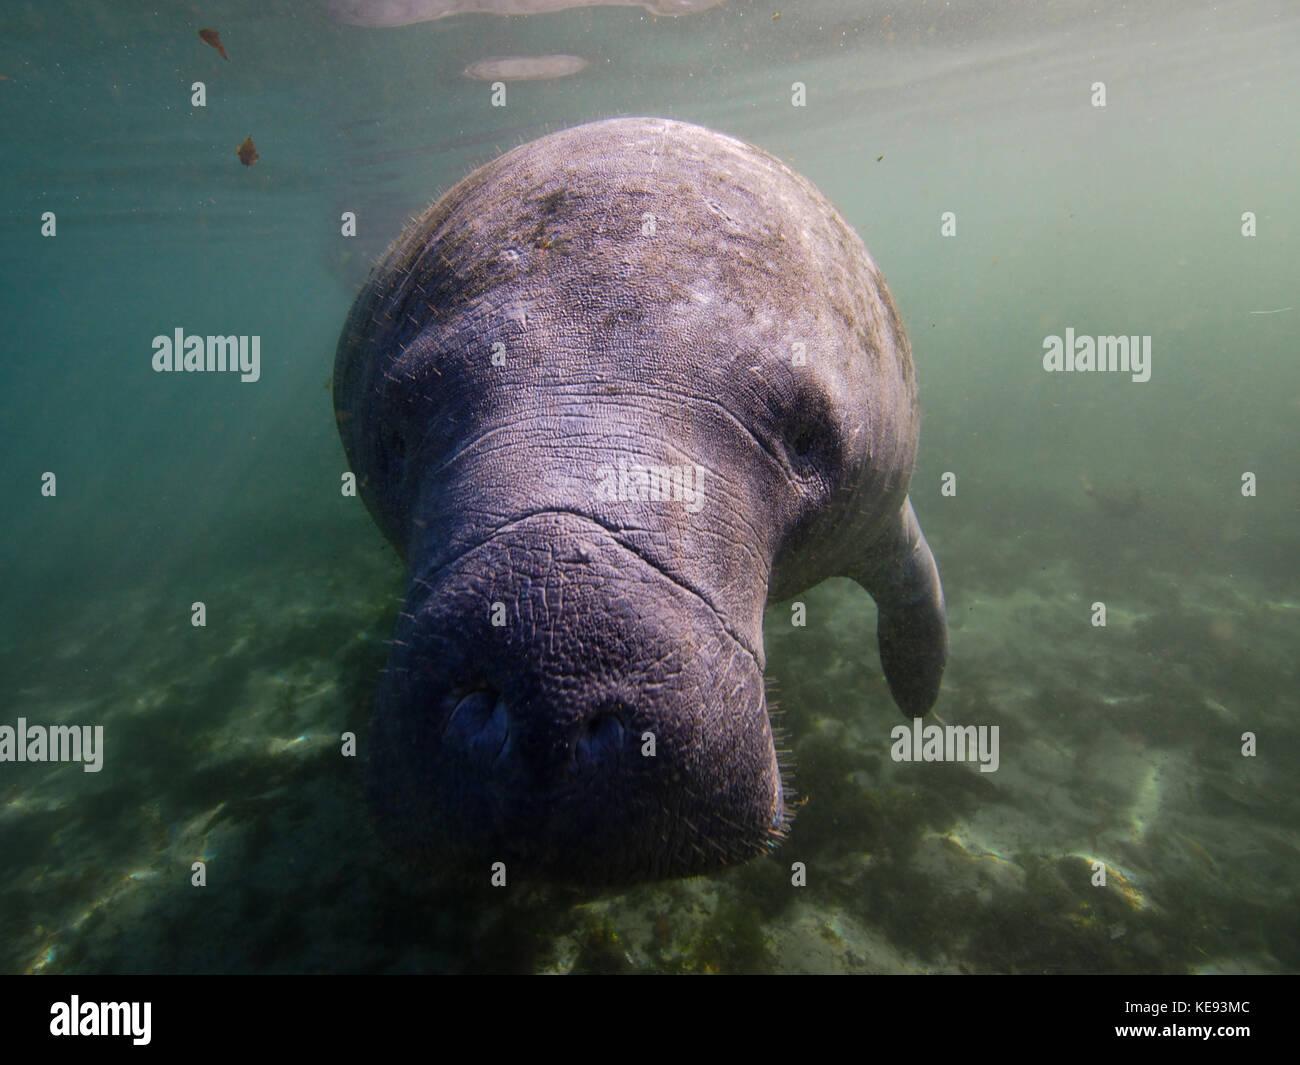 West Indian manatee underwater - Stock Image